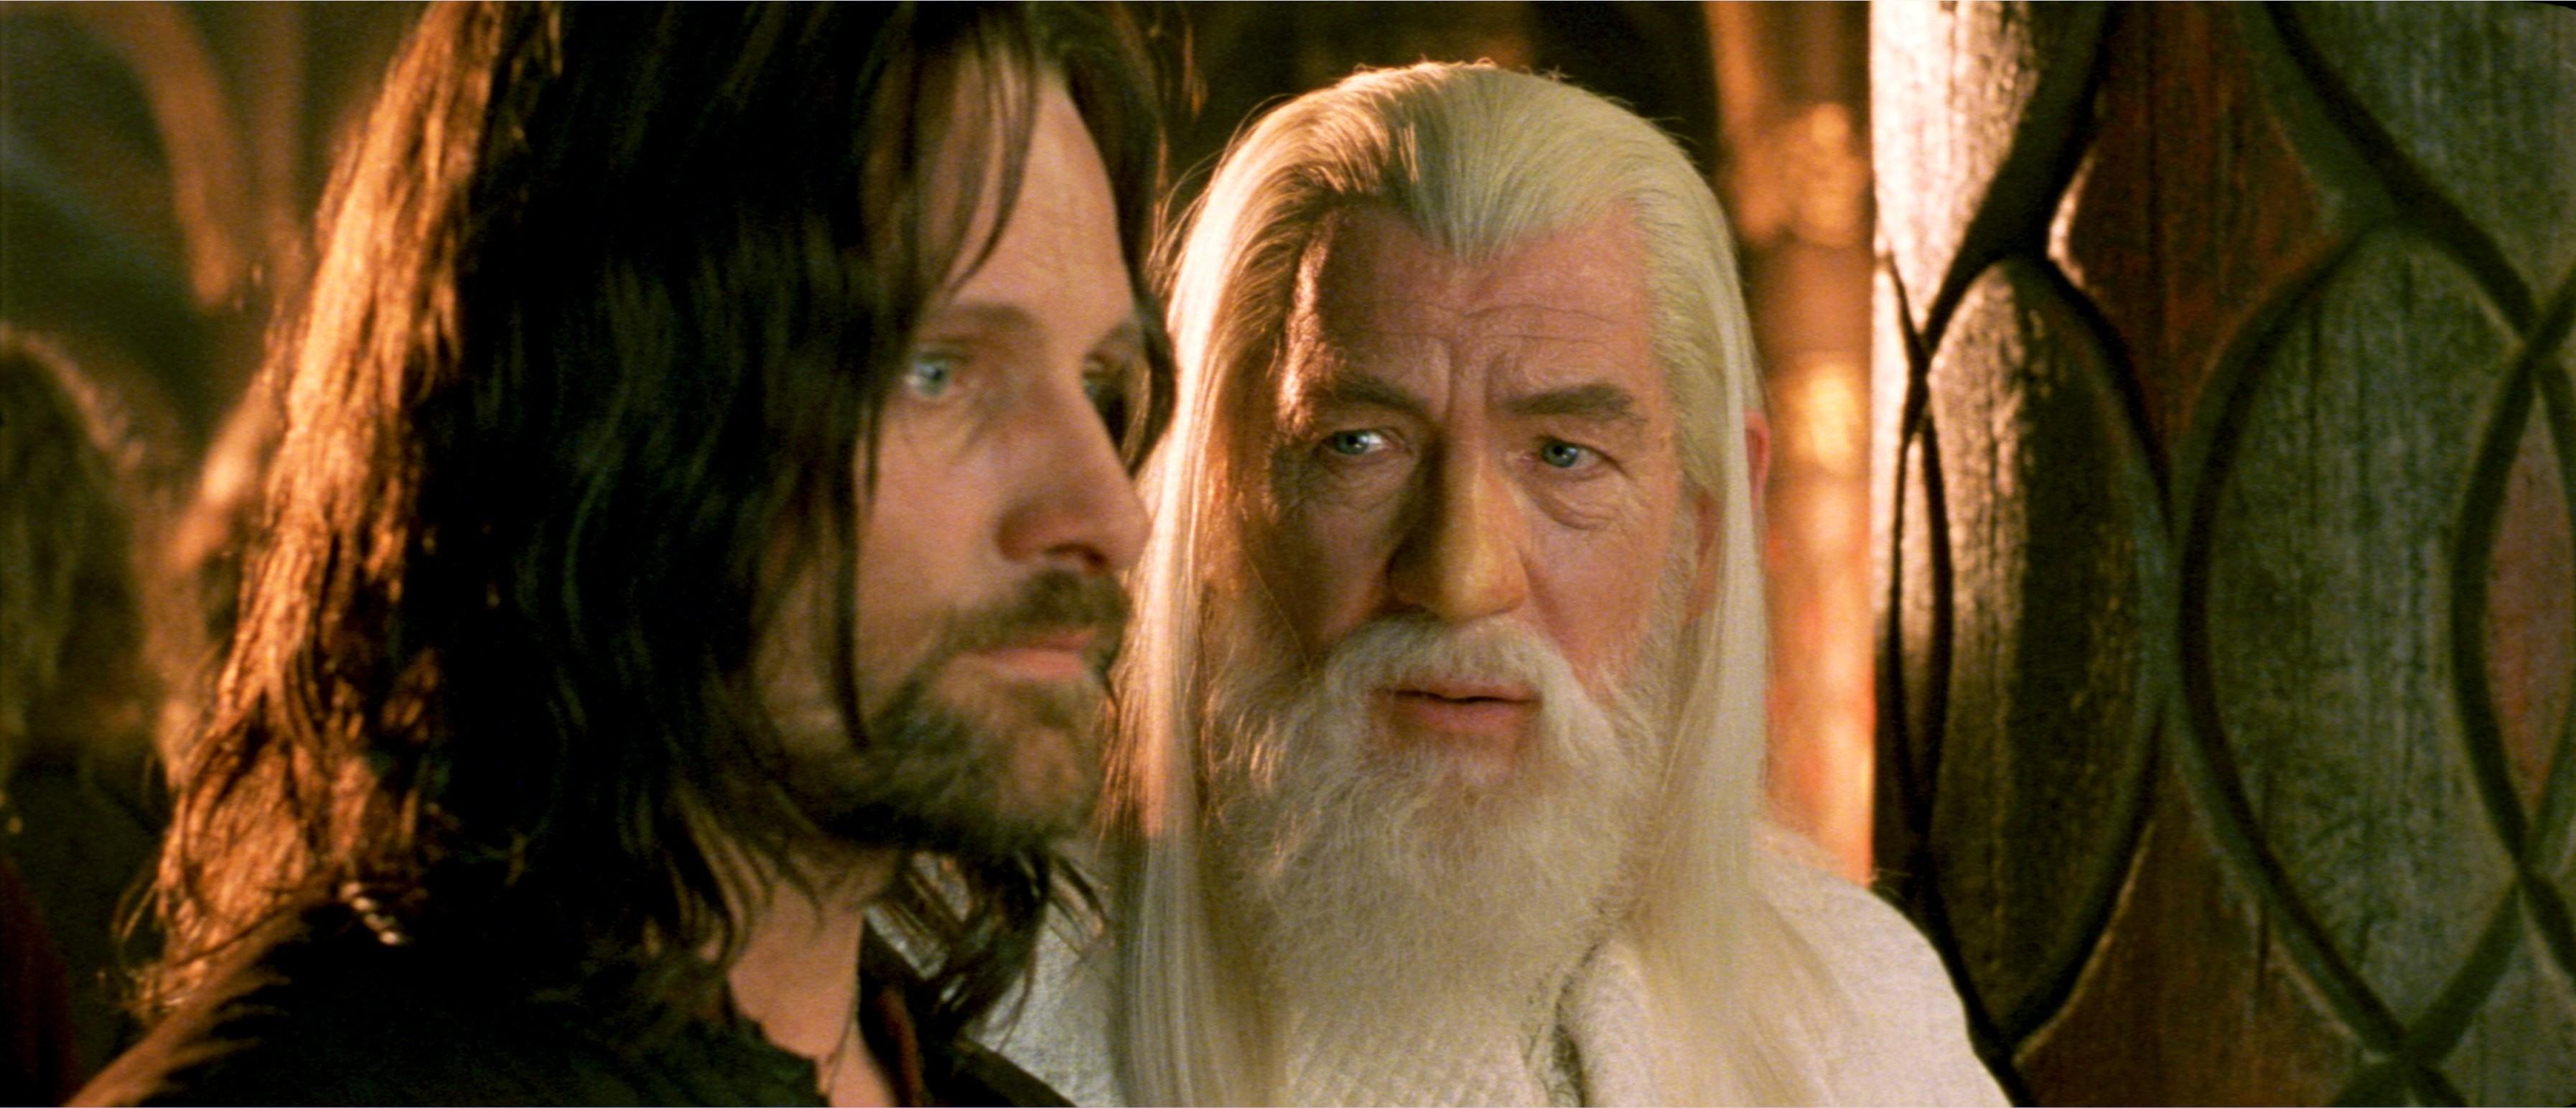 Res: 3588x1543, ... Gandalf, The Lord of the Rings, Aragorn, Viggo Mortensen, Ian Mckellen,  ...